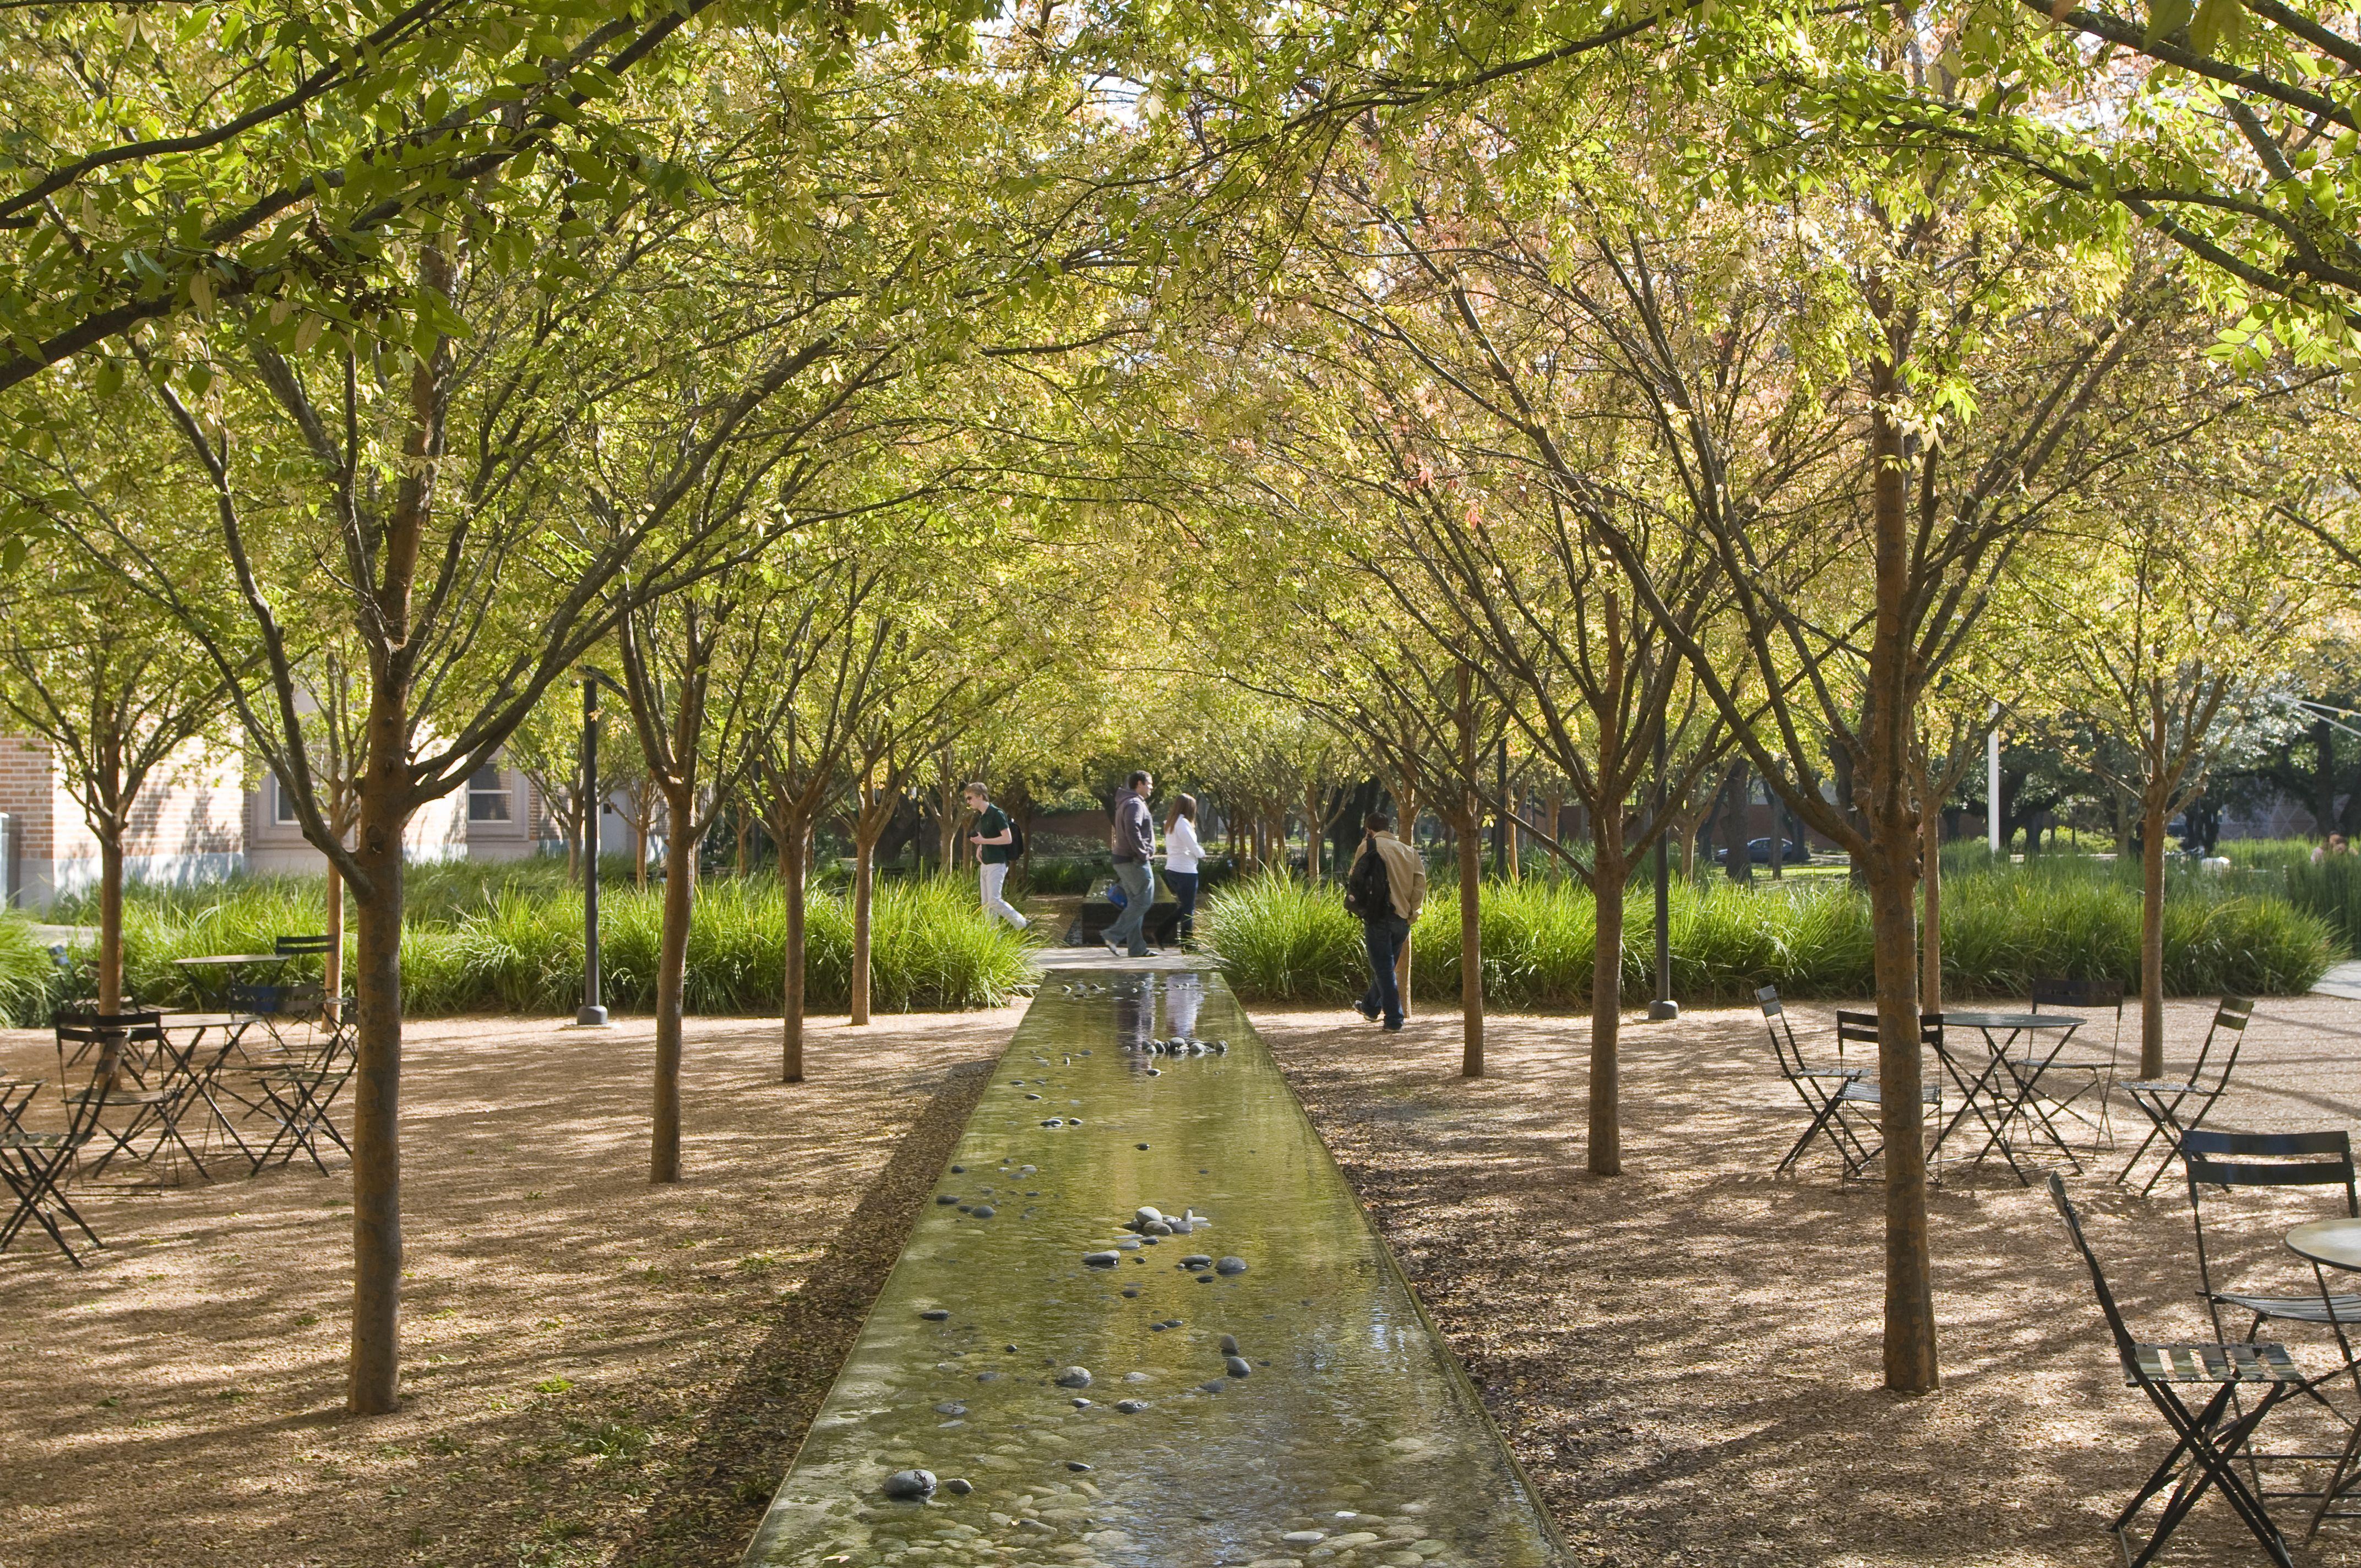 brochstein pavilion @ rice university | landscape architecture ...